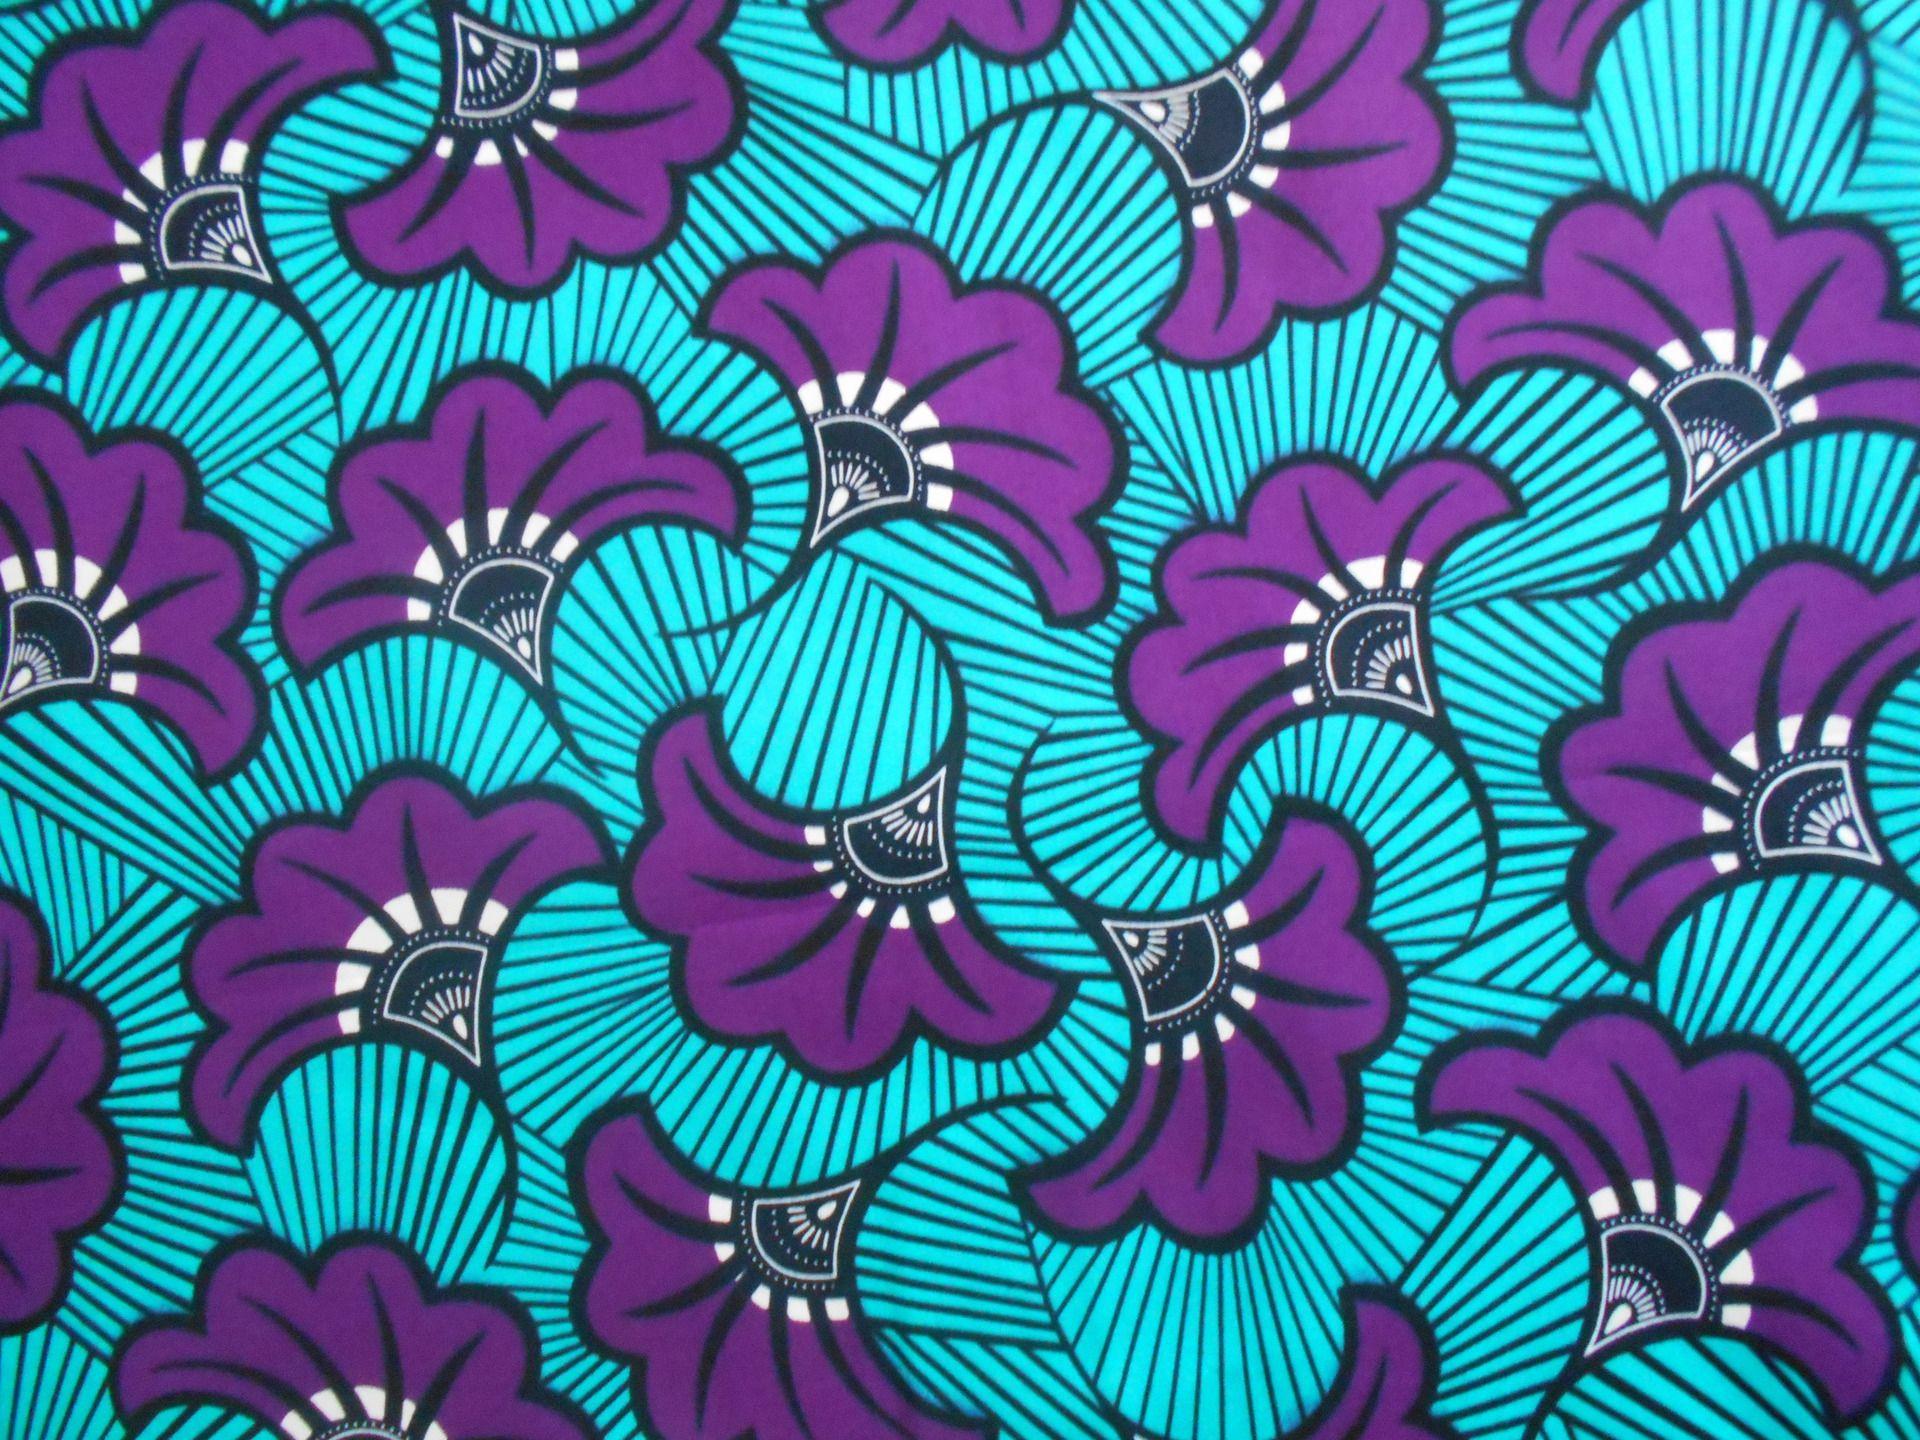 Wax Tissu Pagne Africain En Coupon 39cm X 55cm Tissu Africain Tissu Africain Wax Africaine